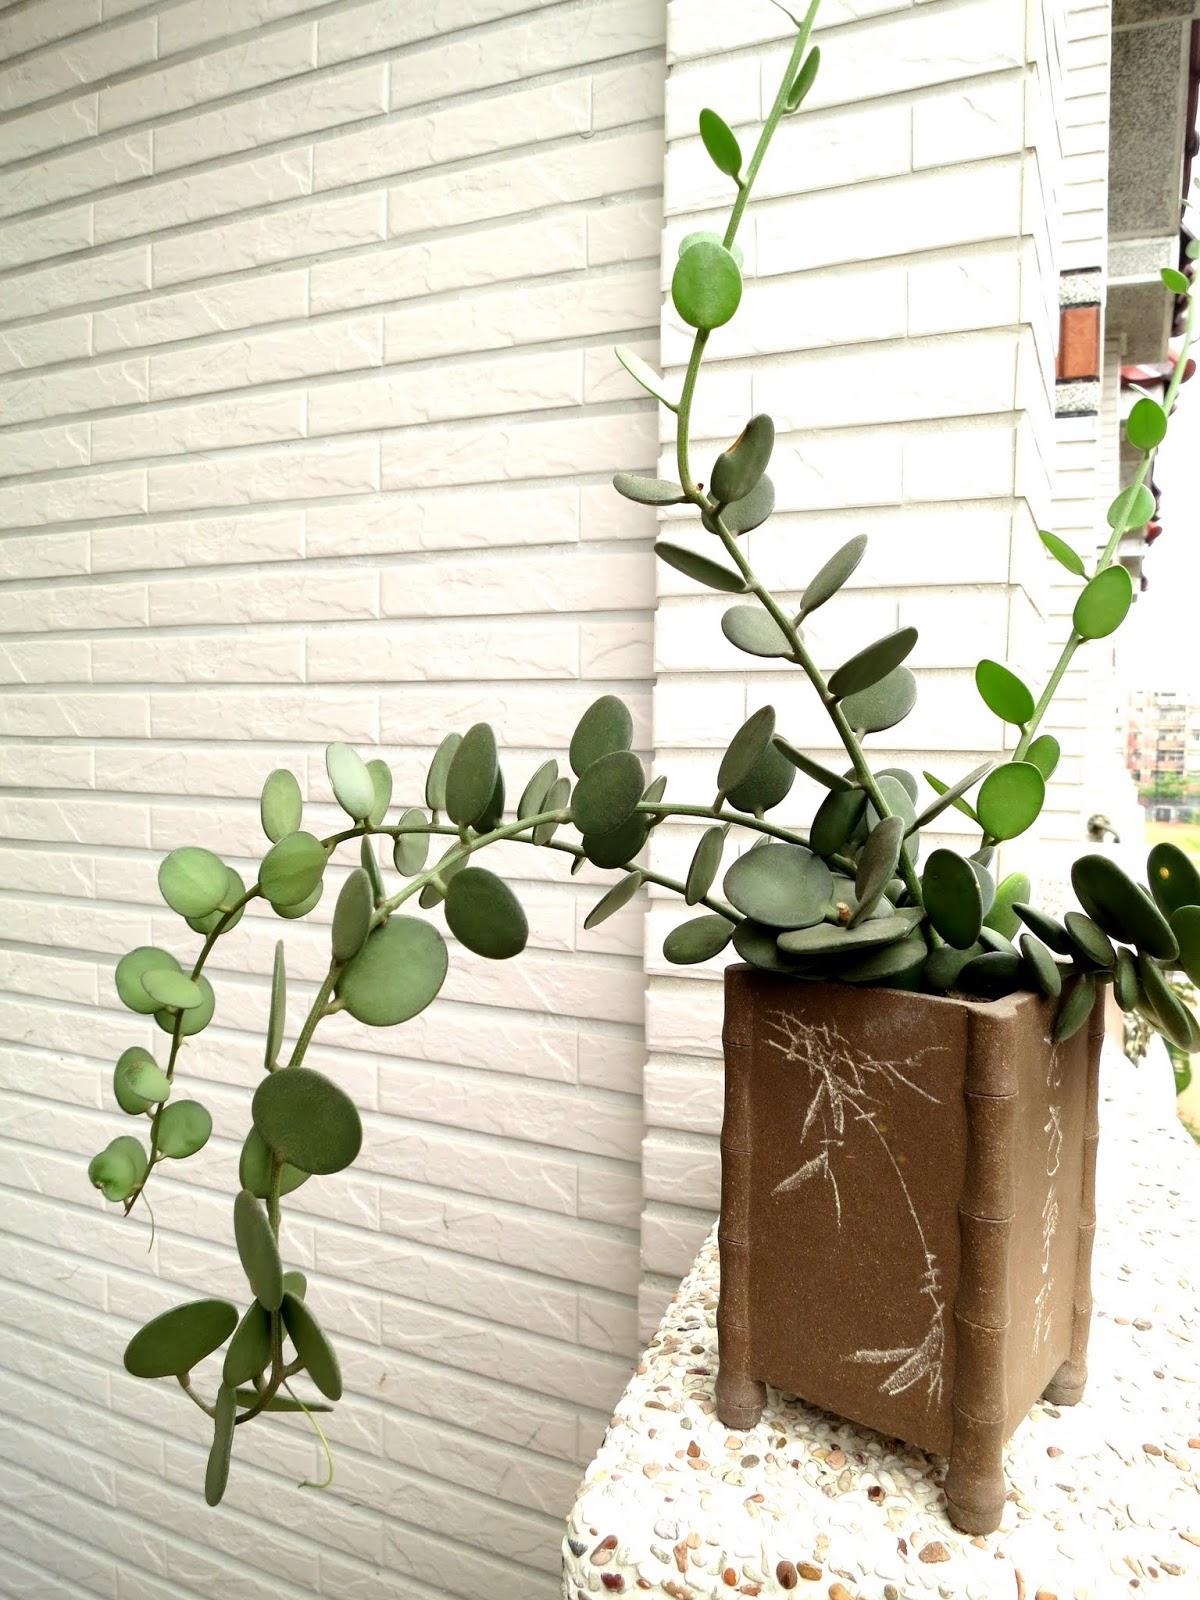 Succulents-lover 阿多肉: 我的葫蘆科圖鑑